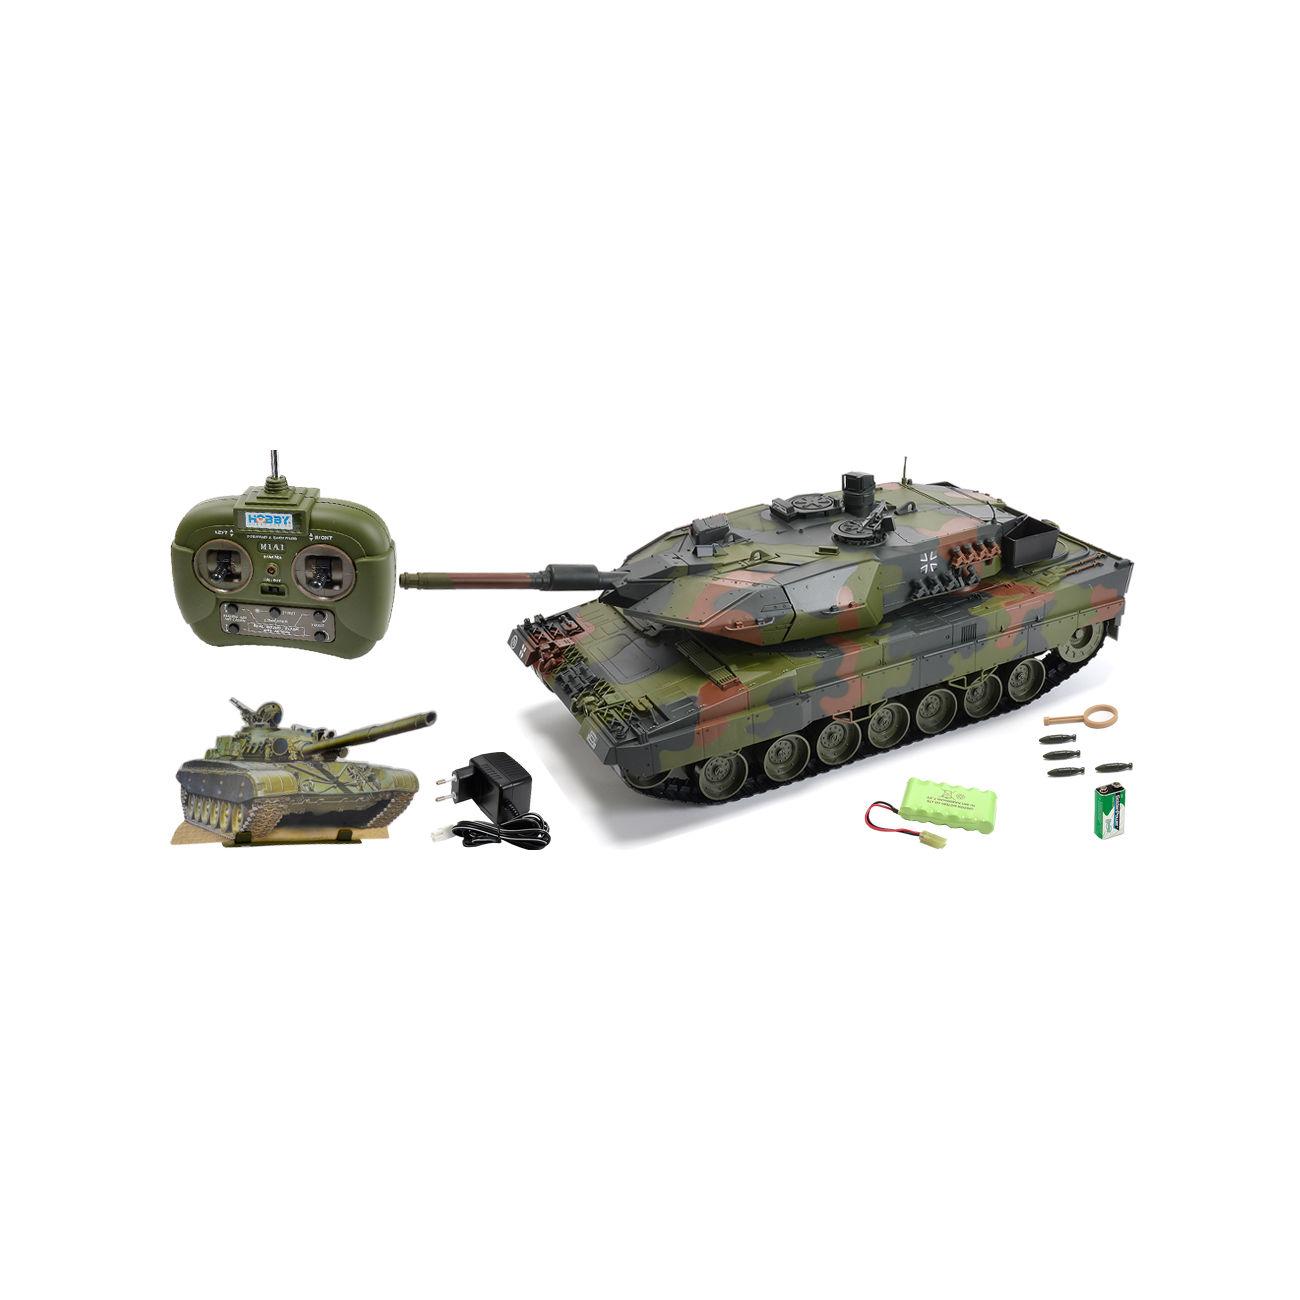 carson rc panzer leopard 2a5 mit 4 raketen gr ntarn 1 16. Black Bedroom Furniture Sets. Home Design Ideas